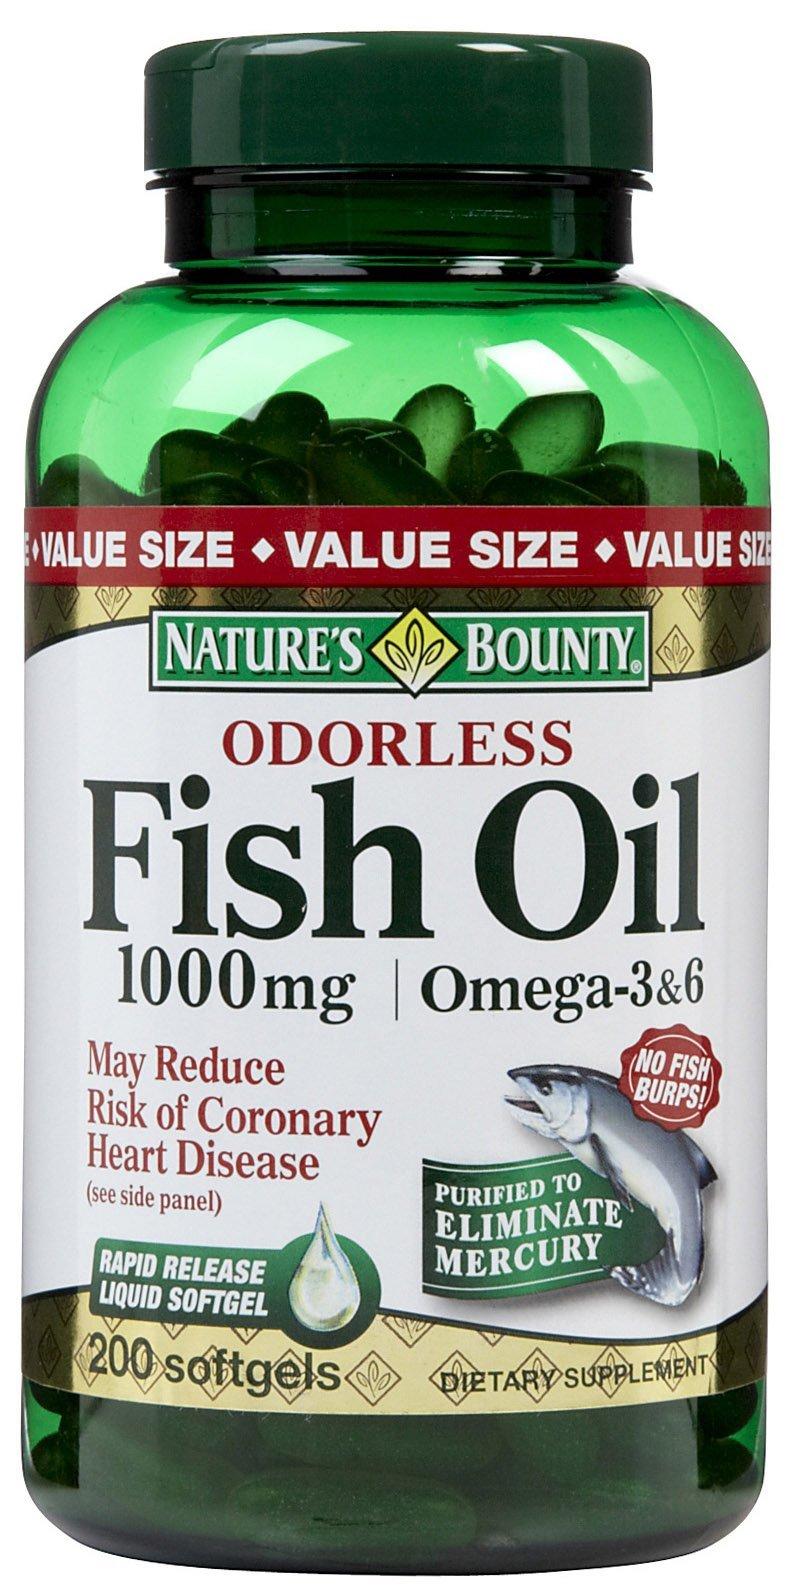 Nb Fish Oil 1000mg Oderle Size 200ct Nb Fish Oil 1000mg Oderless Omega-3 & Omega-6 Softgels 200ct